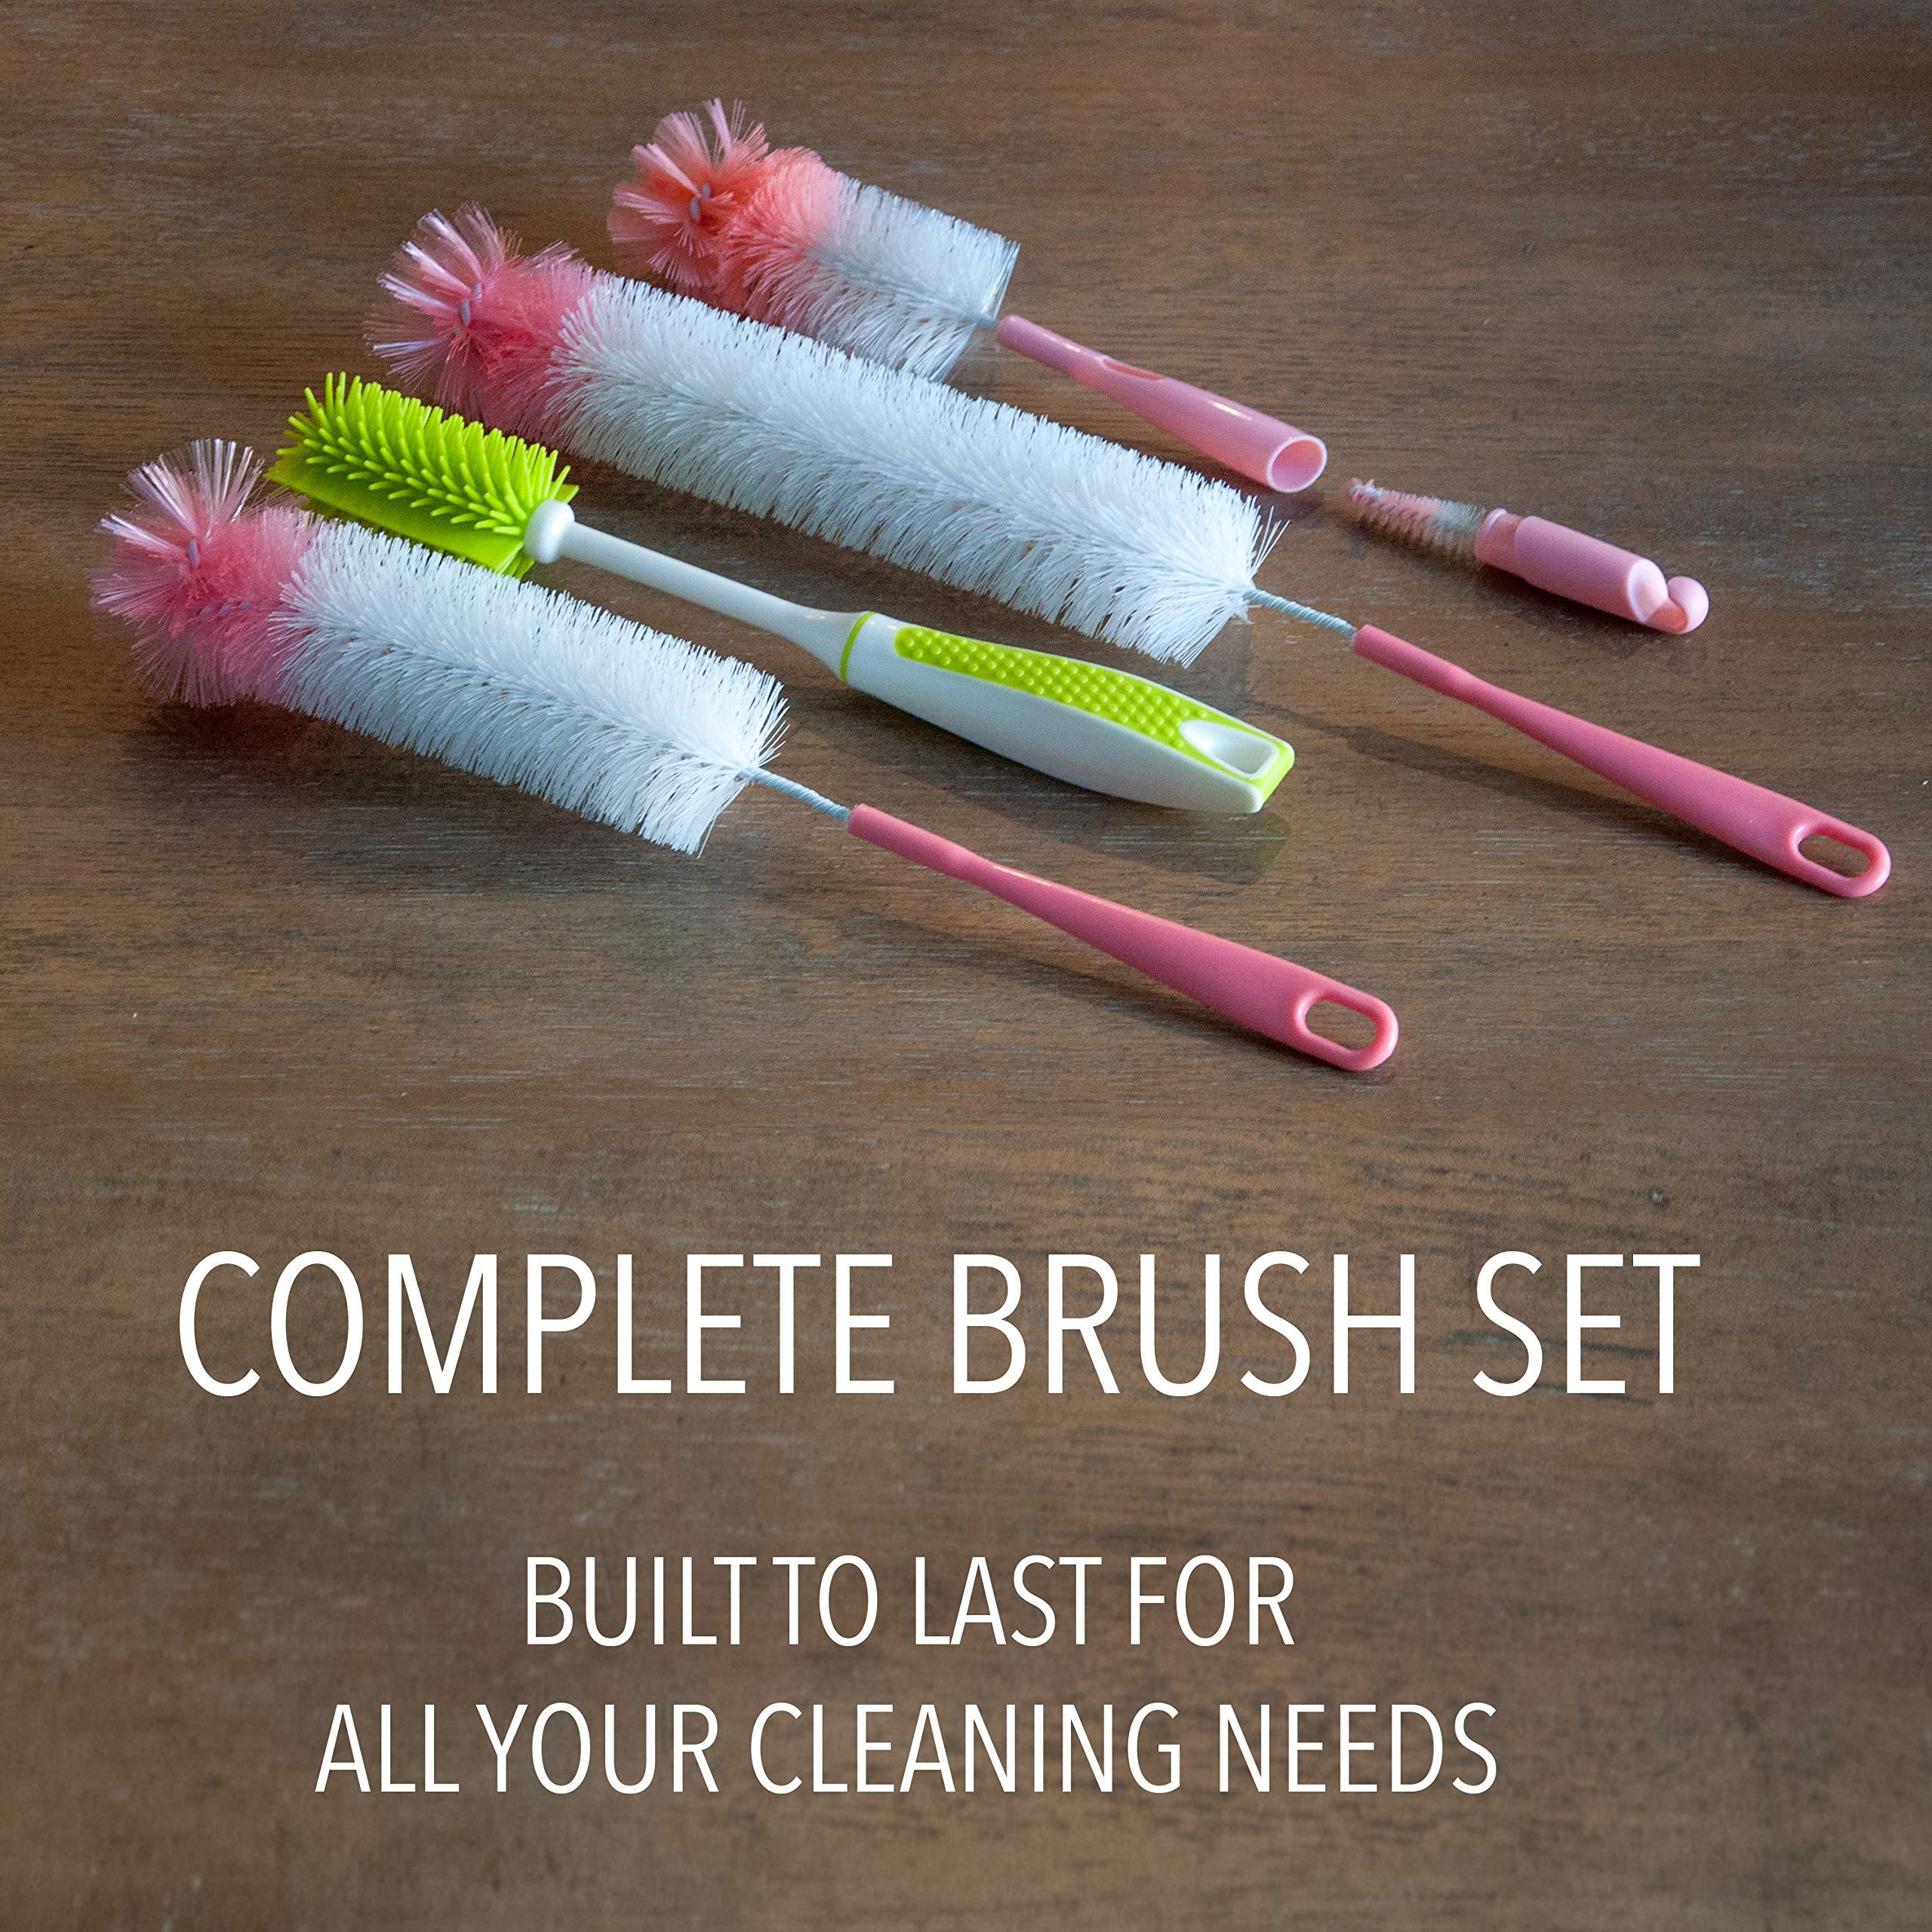 Bottle Brushes for Cleaning - 4 Pcs of Silicone and Vinyl Tube Bottle Brush Set | Nipple Cleaning Brush, Narrow Neck Bottle Brush, Long Handle, BPA Free, Dishwasher Safe by Innovative Technology Products Corp (Image #1)